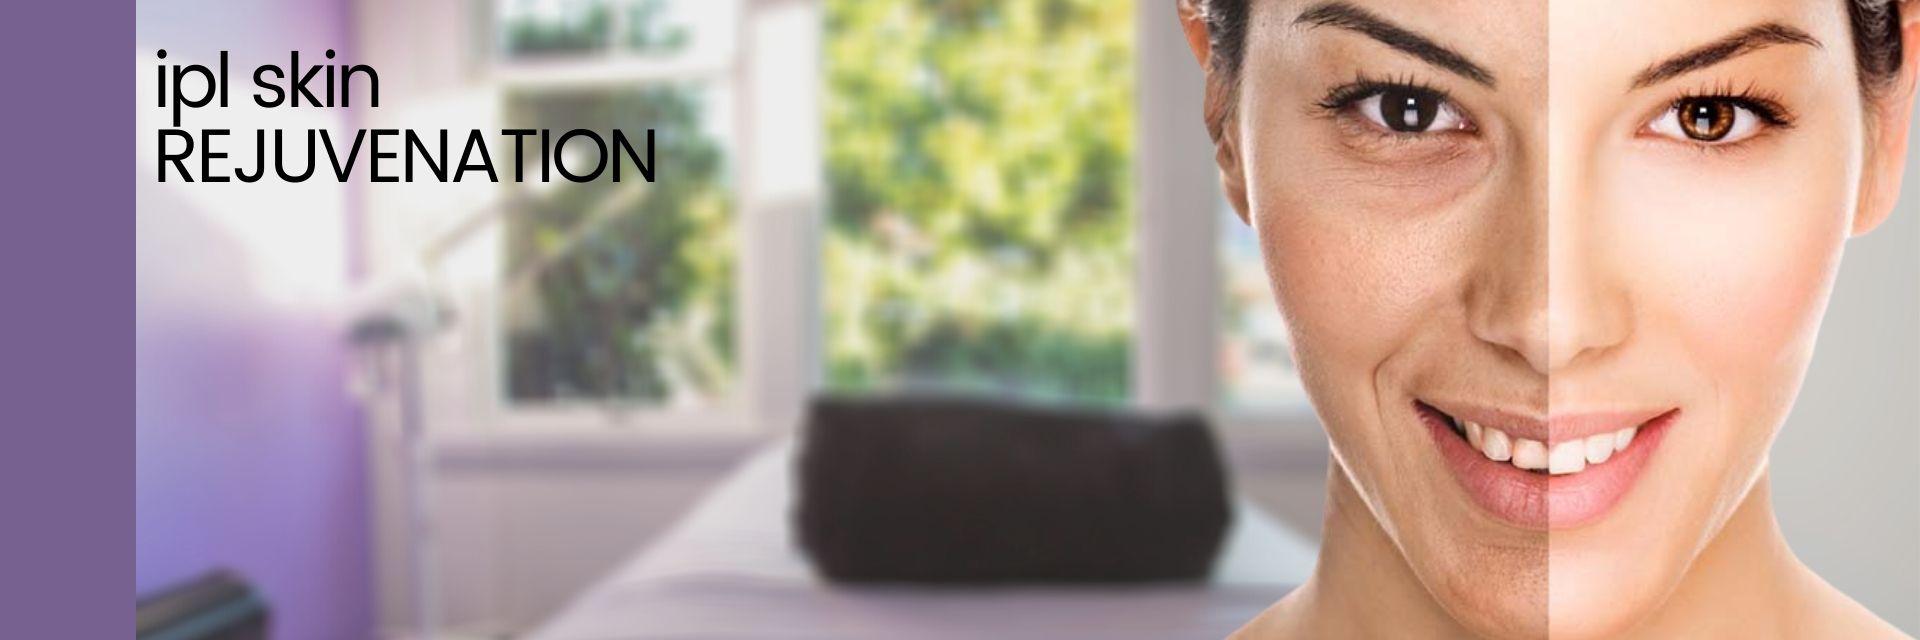 IPL Skin Rejuvenation Christchurch Treatment